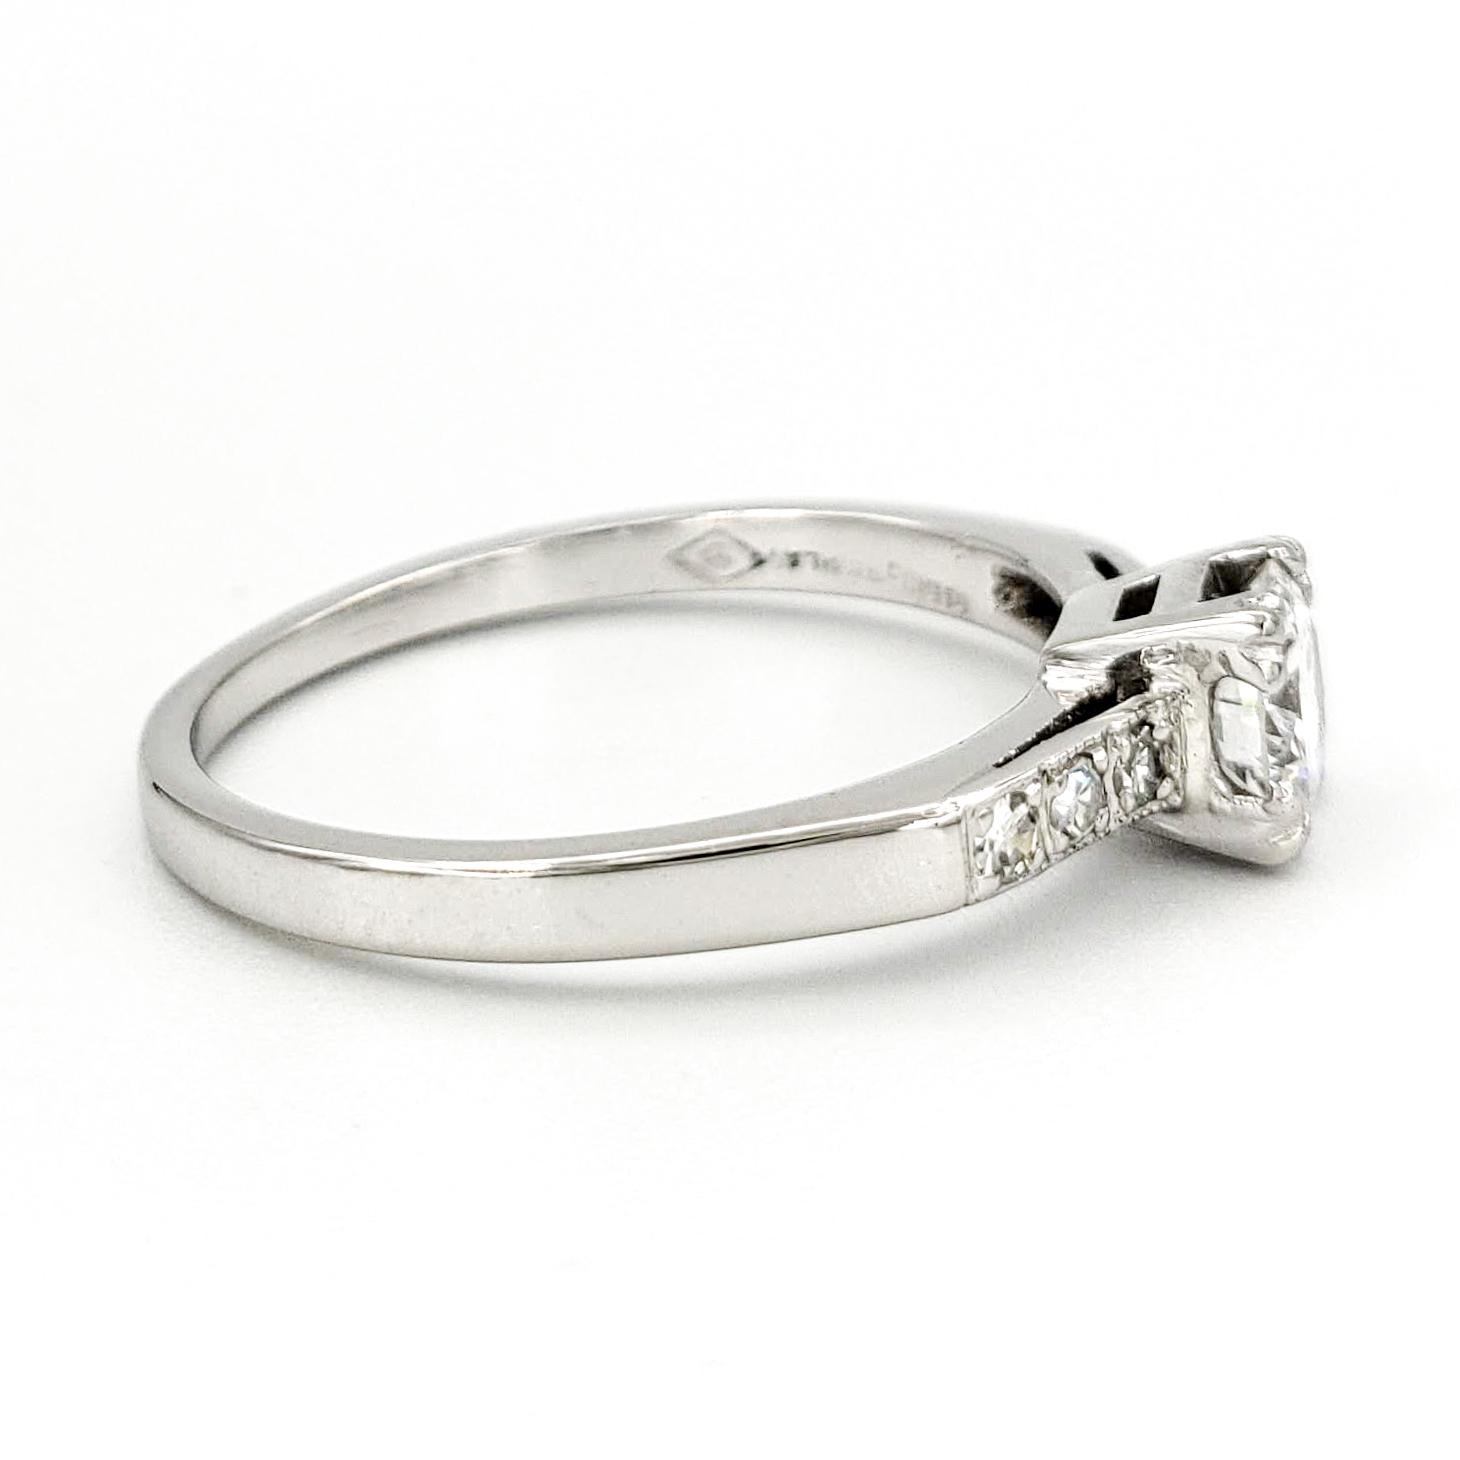 vintage-platinum-engagement-ring-with-0-42-carat-round-brilliant-cut-diamond-egl-d-vs1